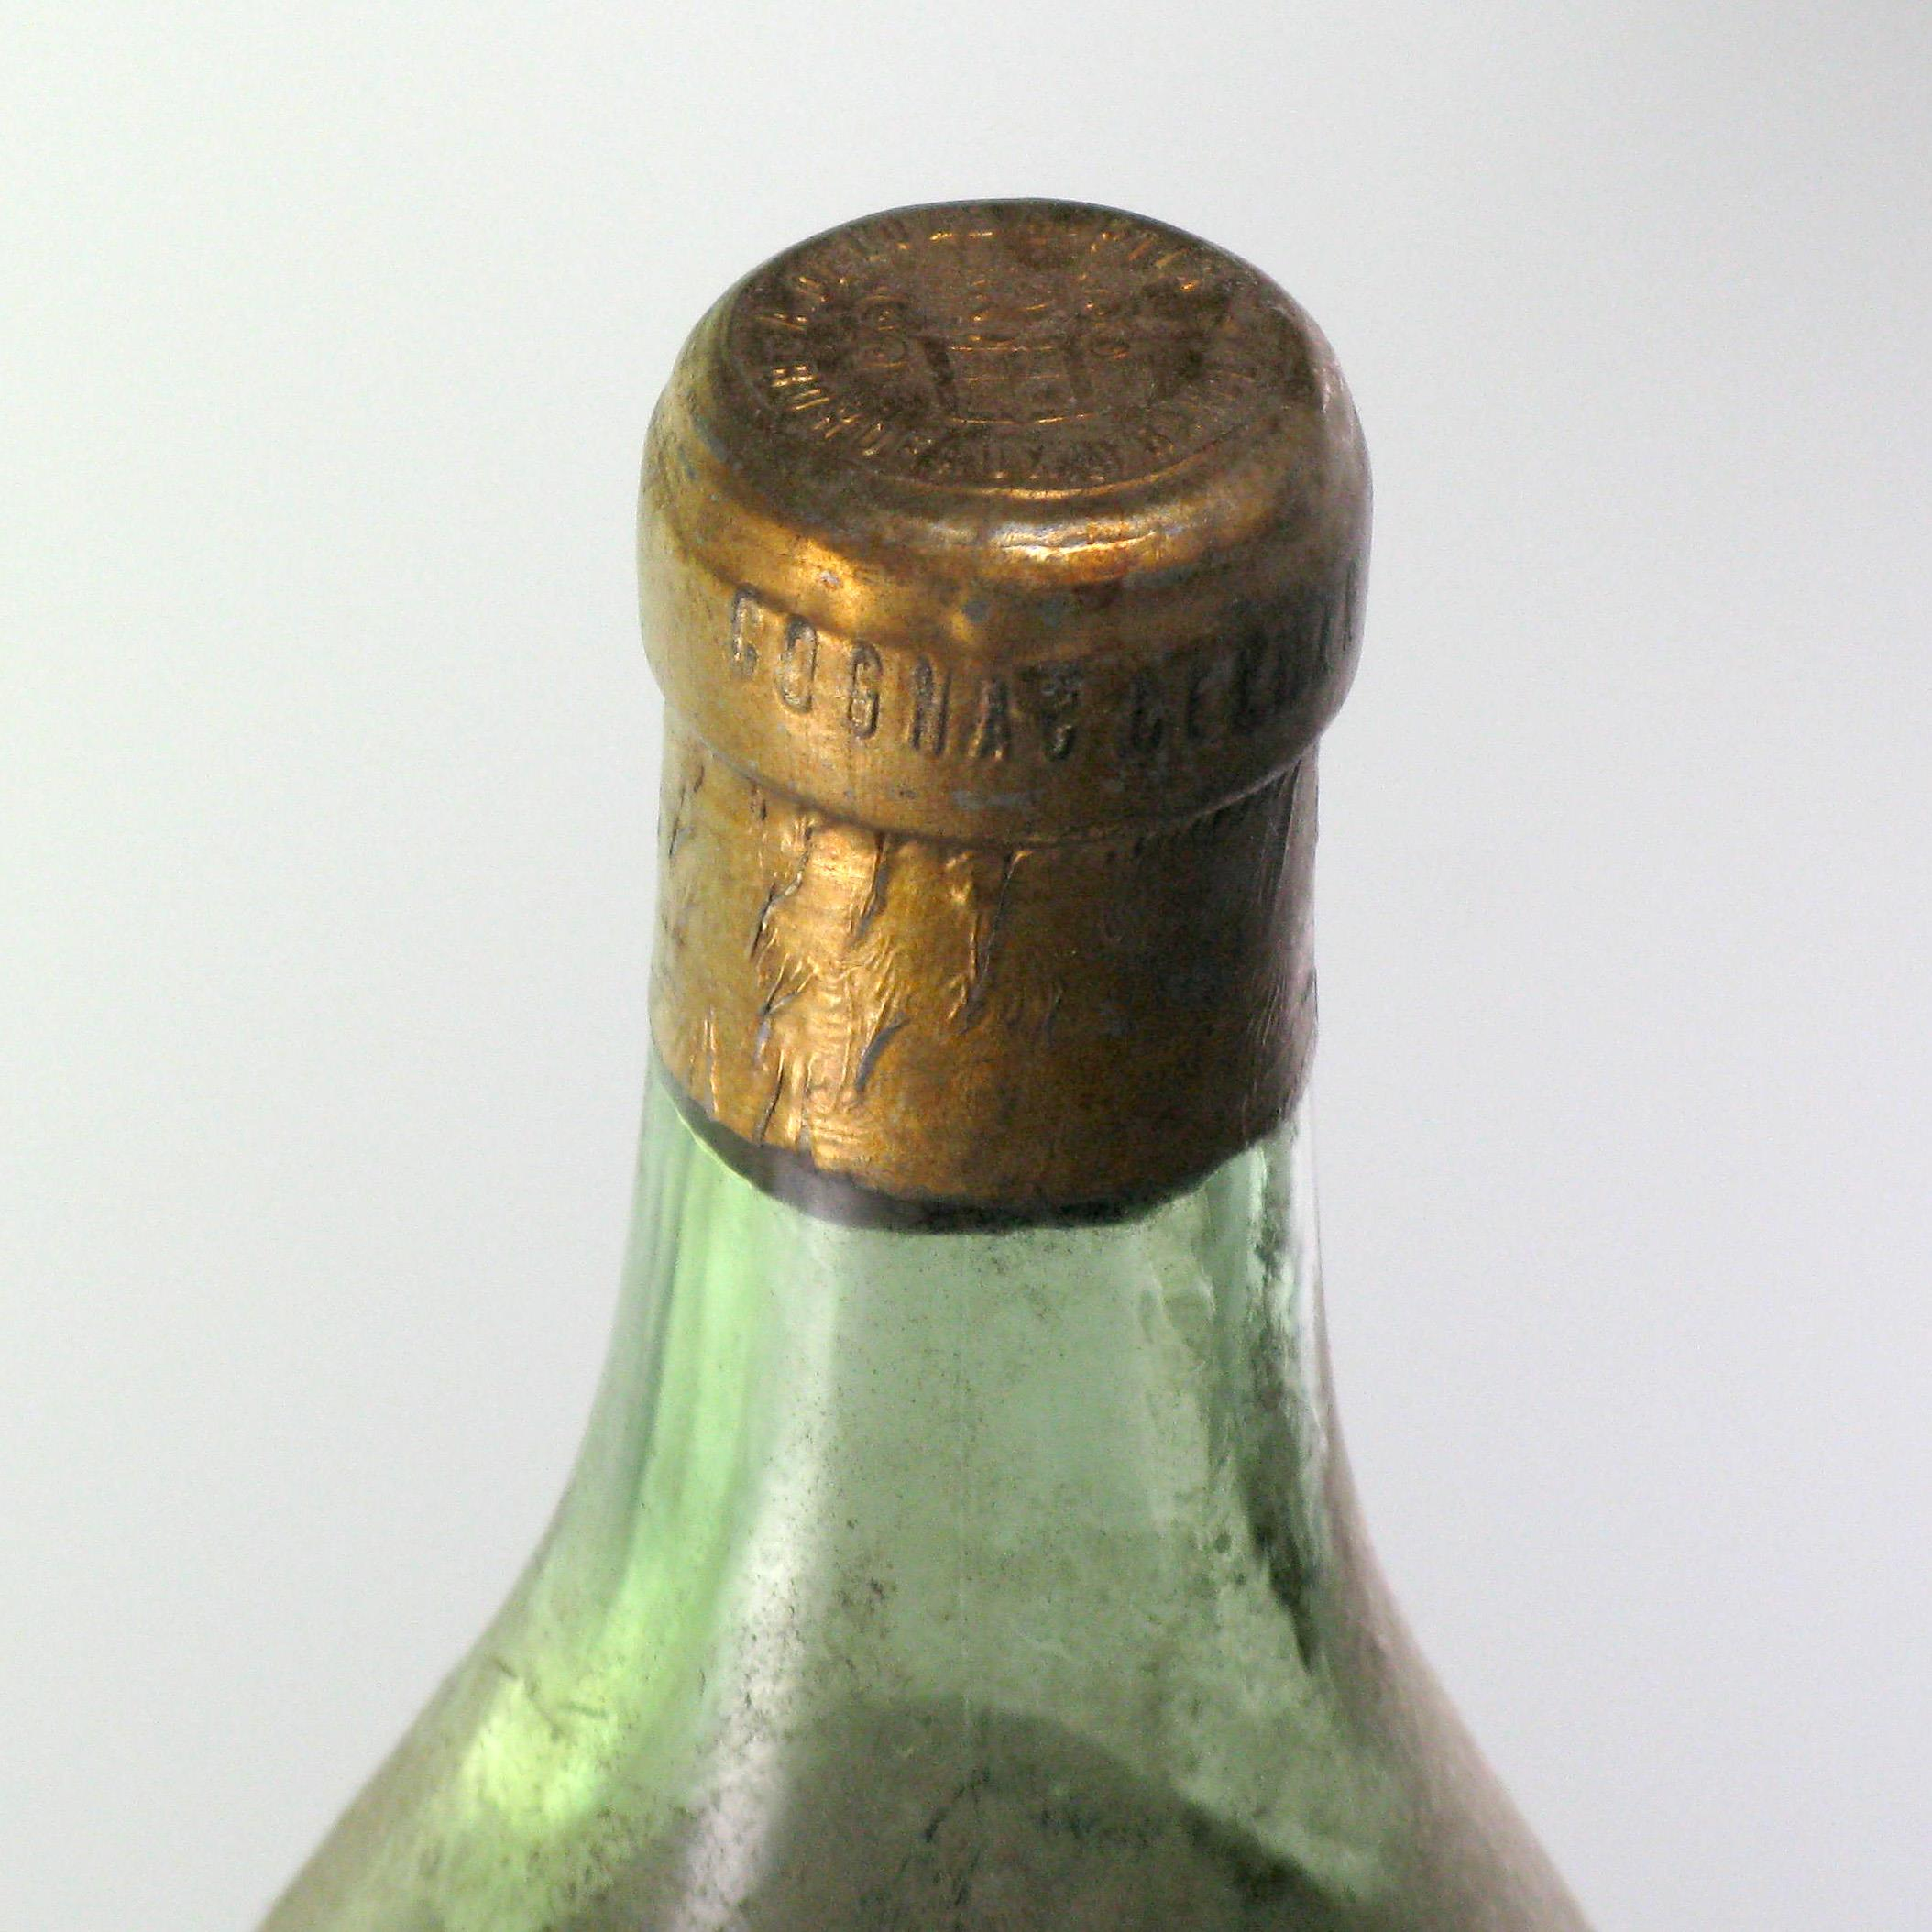 Cognac 1893 A. de Luze